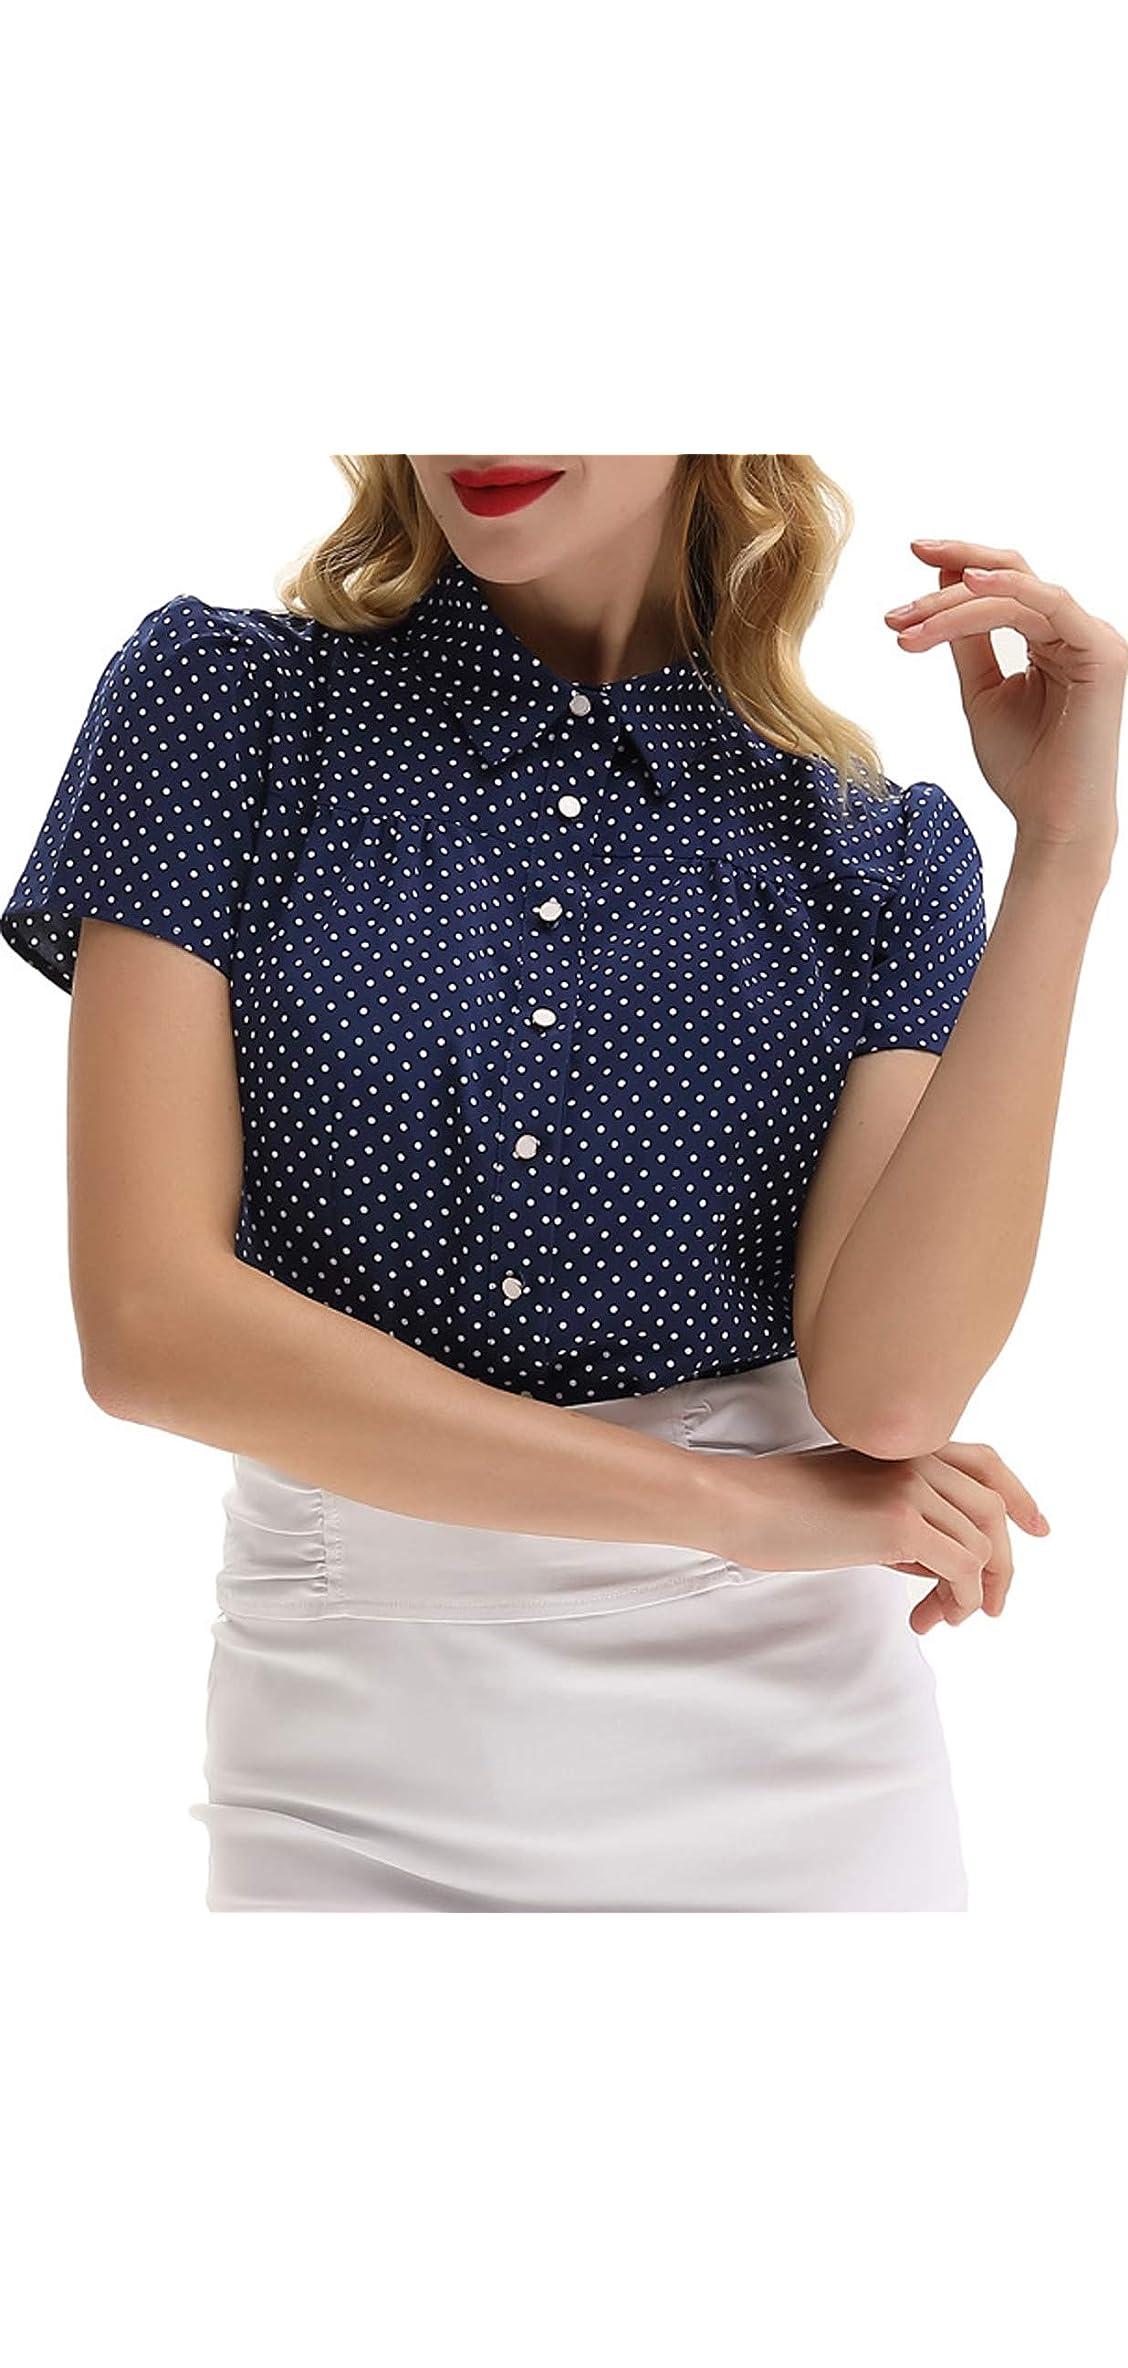 Women's Polka Dot Shirt Tops S Retro Short Tops